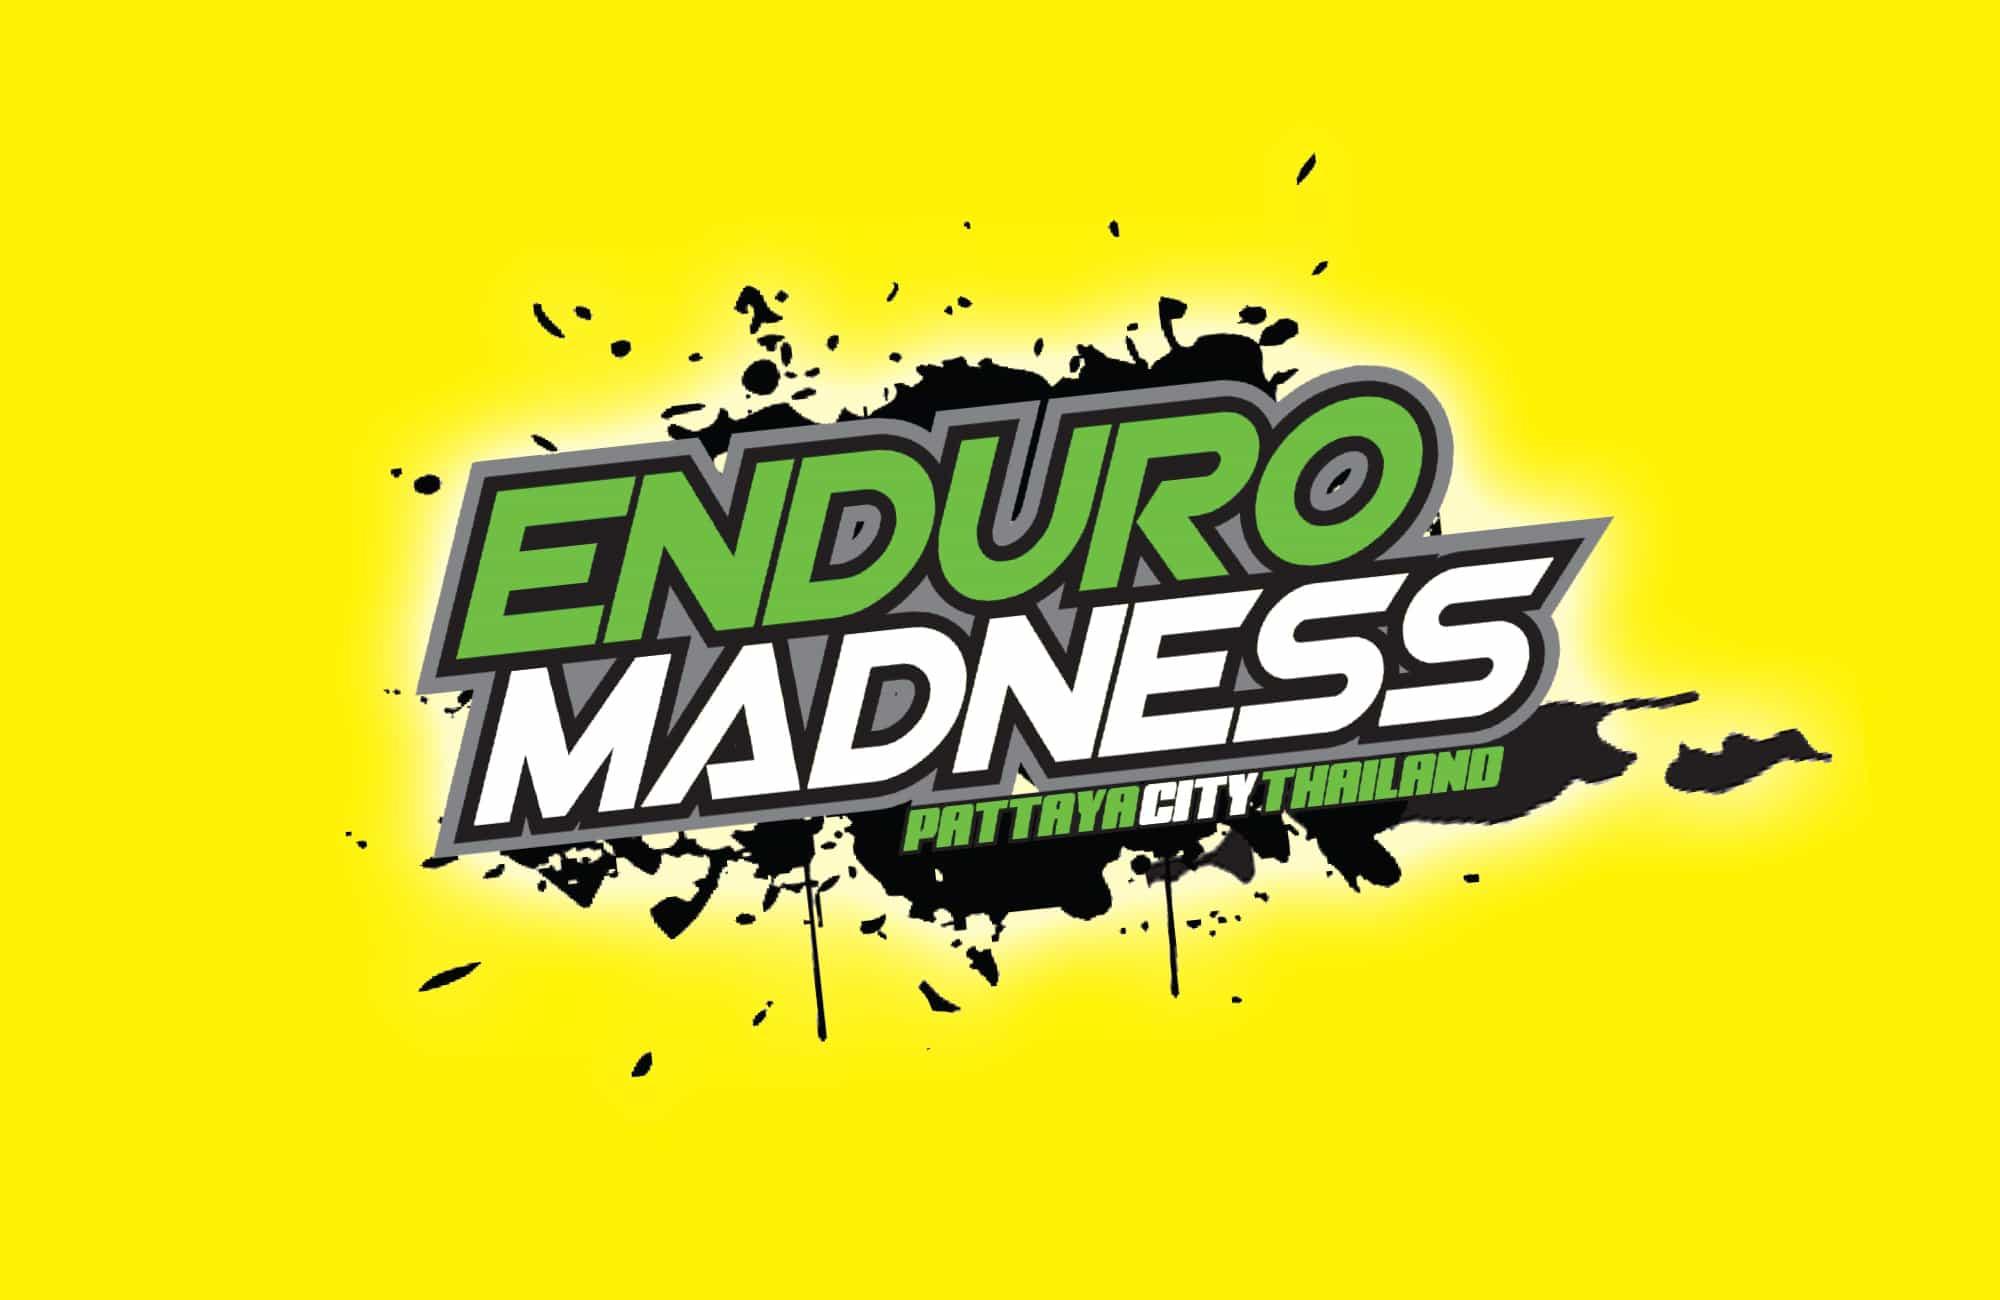 Enduro Madness